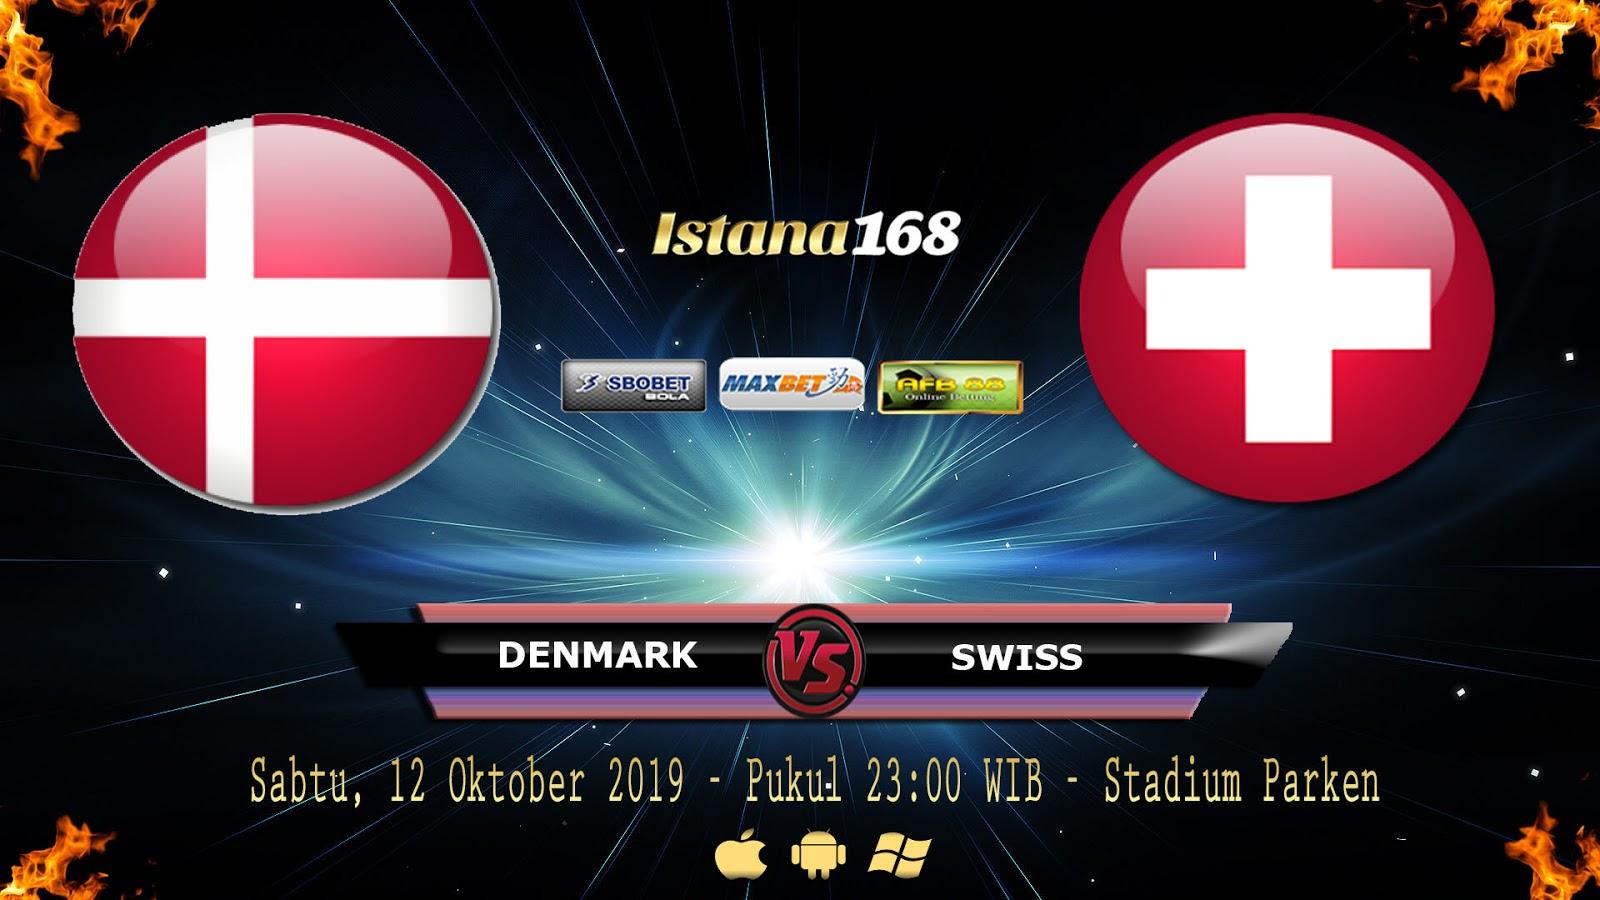 Prediksi Denmark vs Swiss 12 Oktober 2019